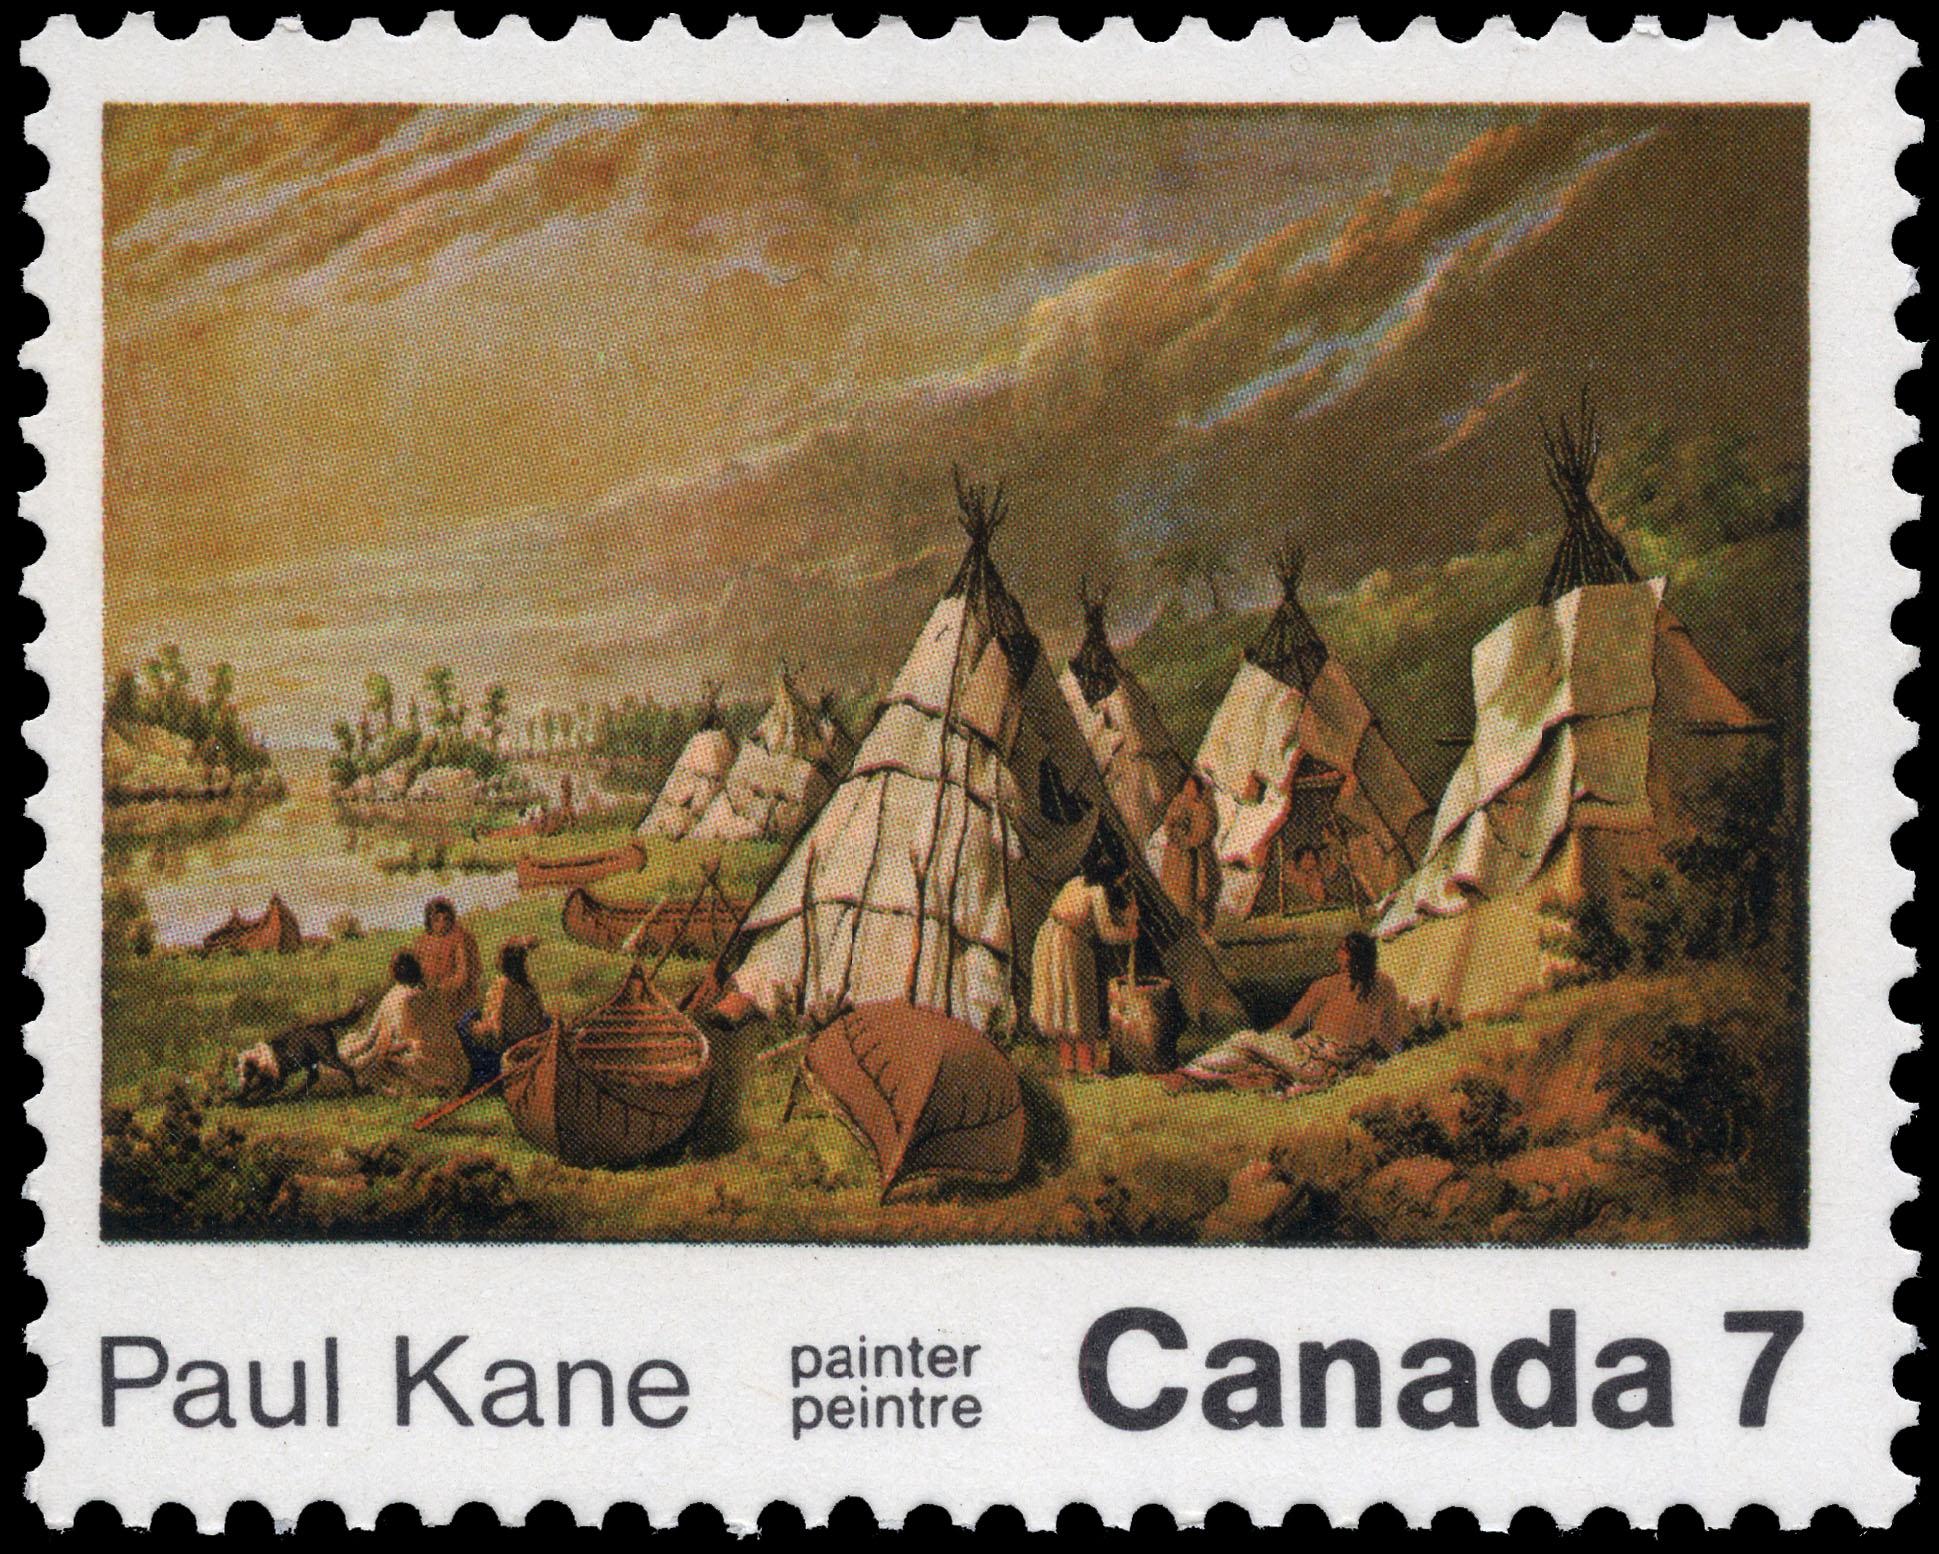 Paul Kane, painter Canada Postage Stamp